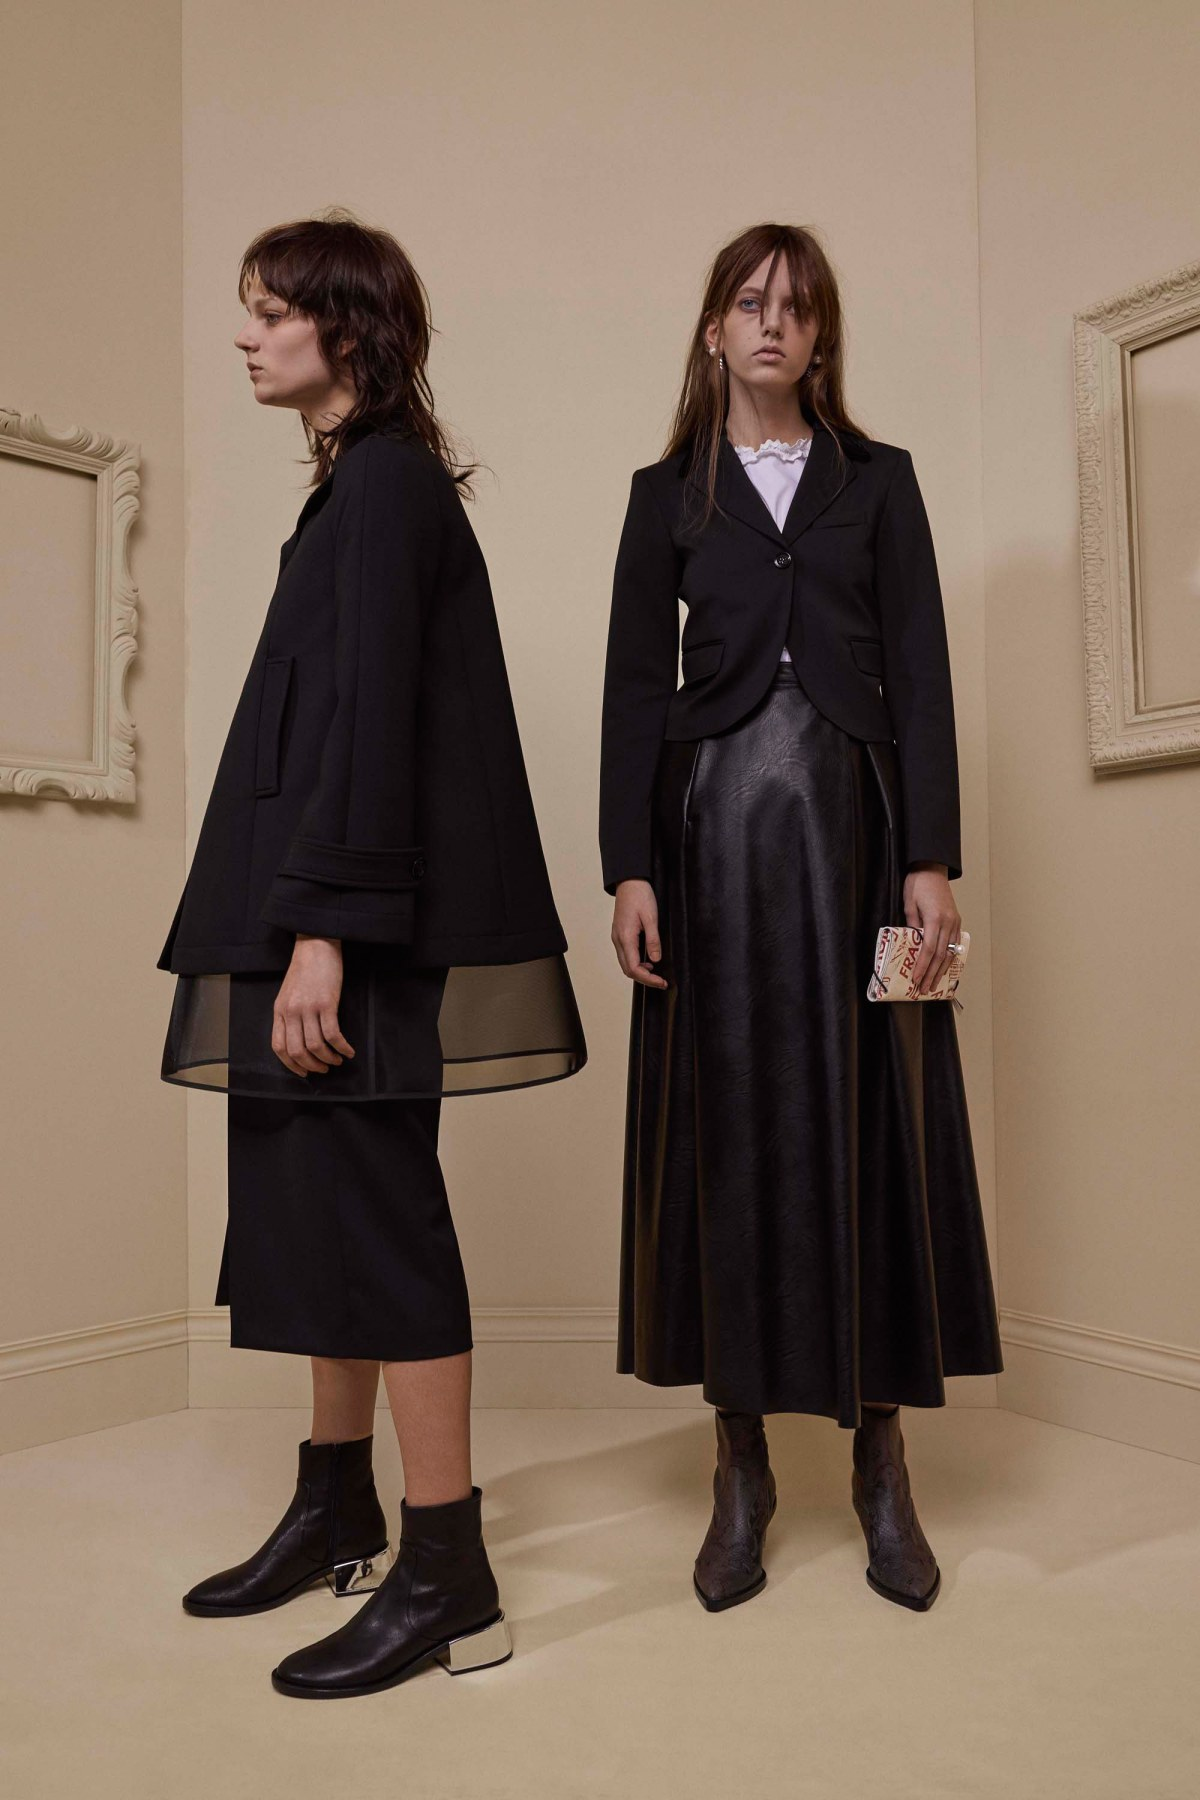 mm6-maison-margiela-pre-fall-2017-fashion-show-the-impression-01